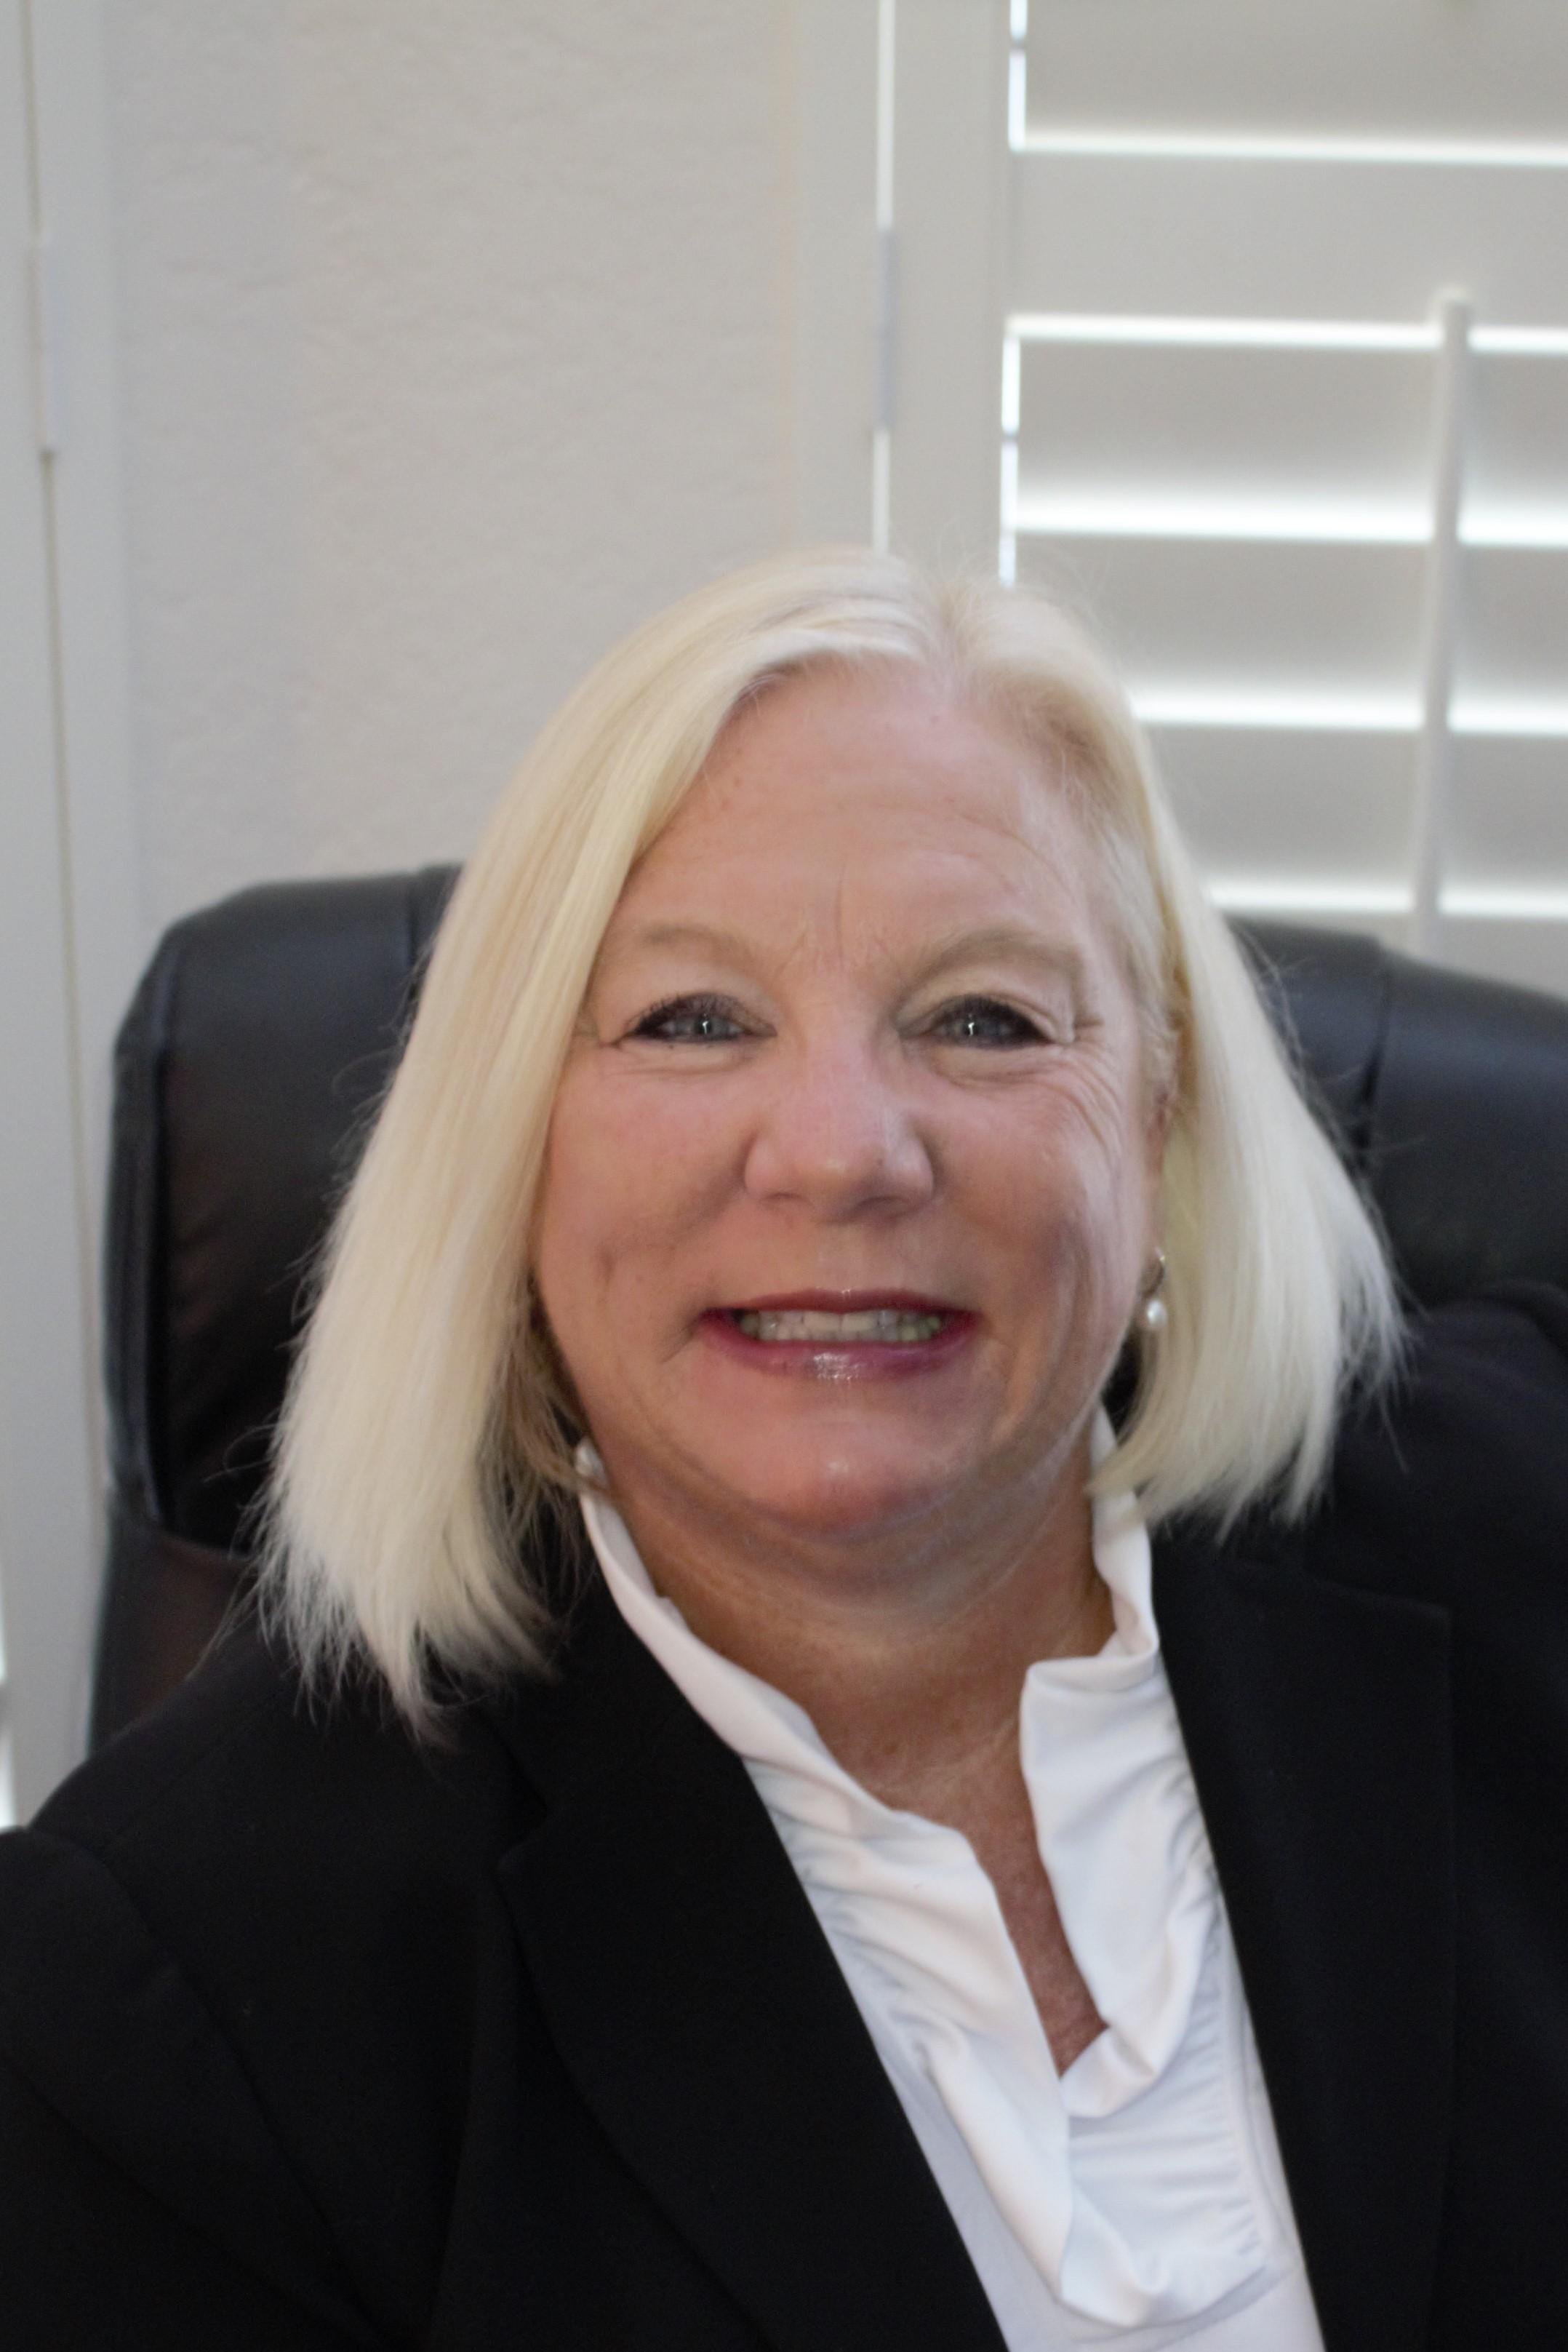 Sharon D. Hightower